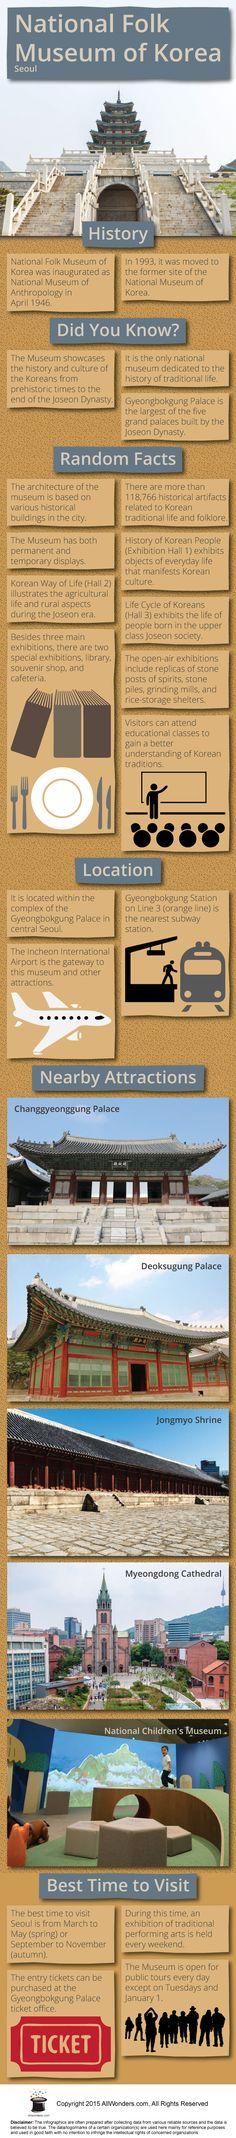 National Folk Museum of Korea Infographic